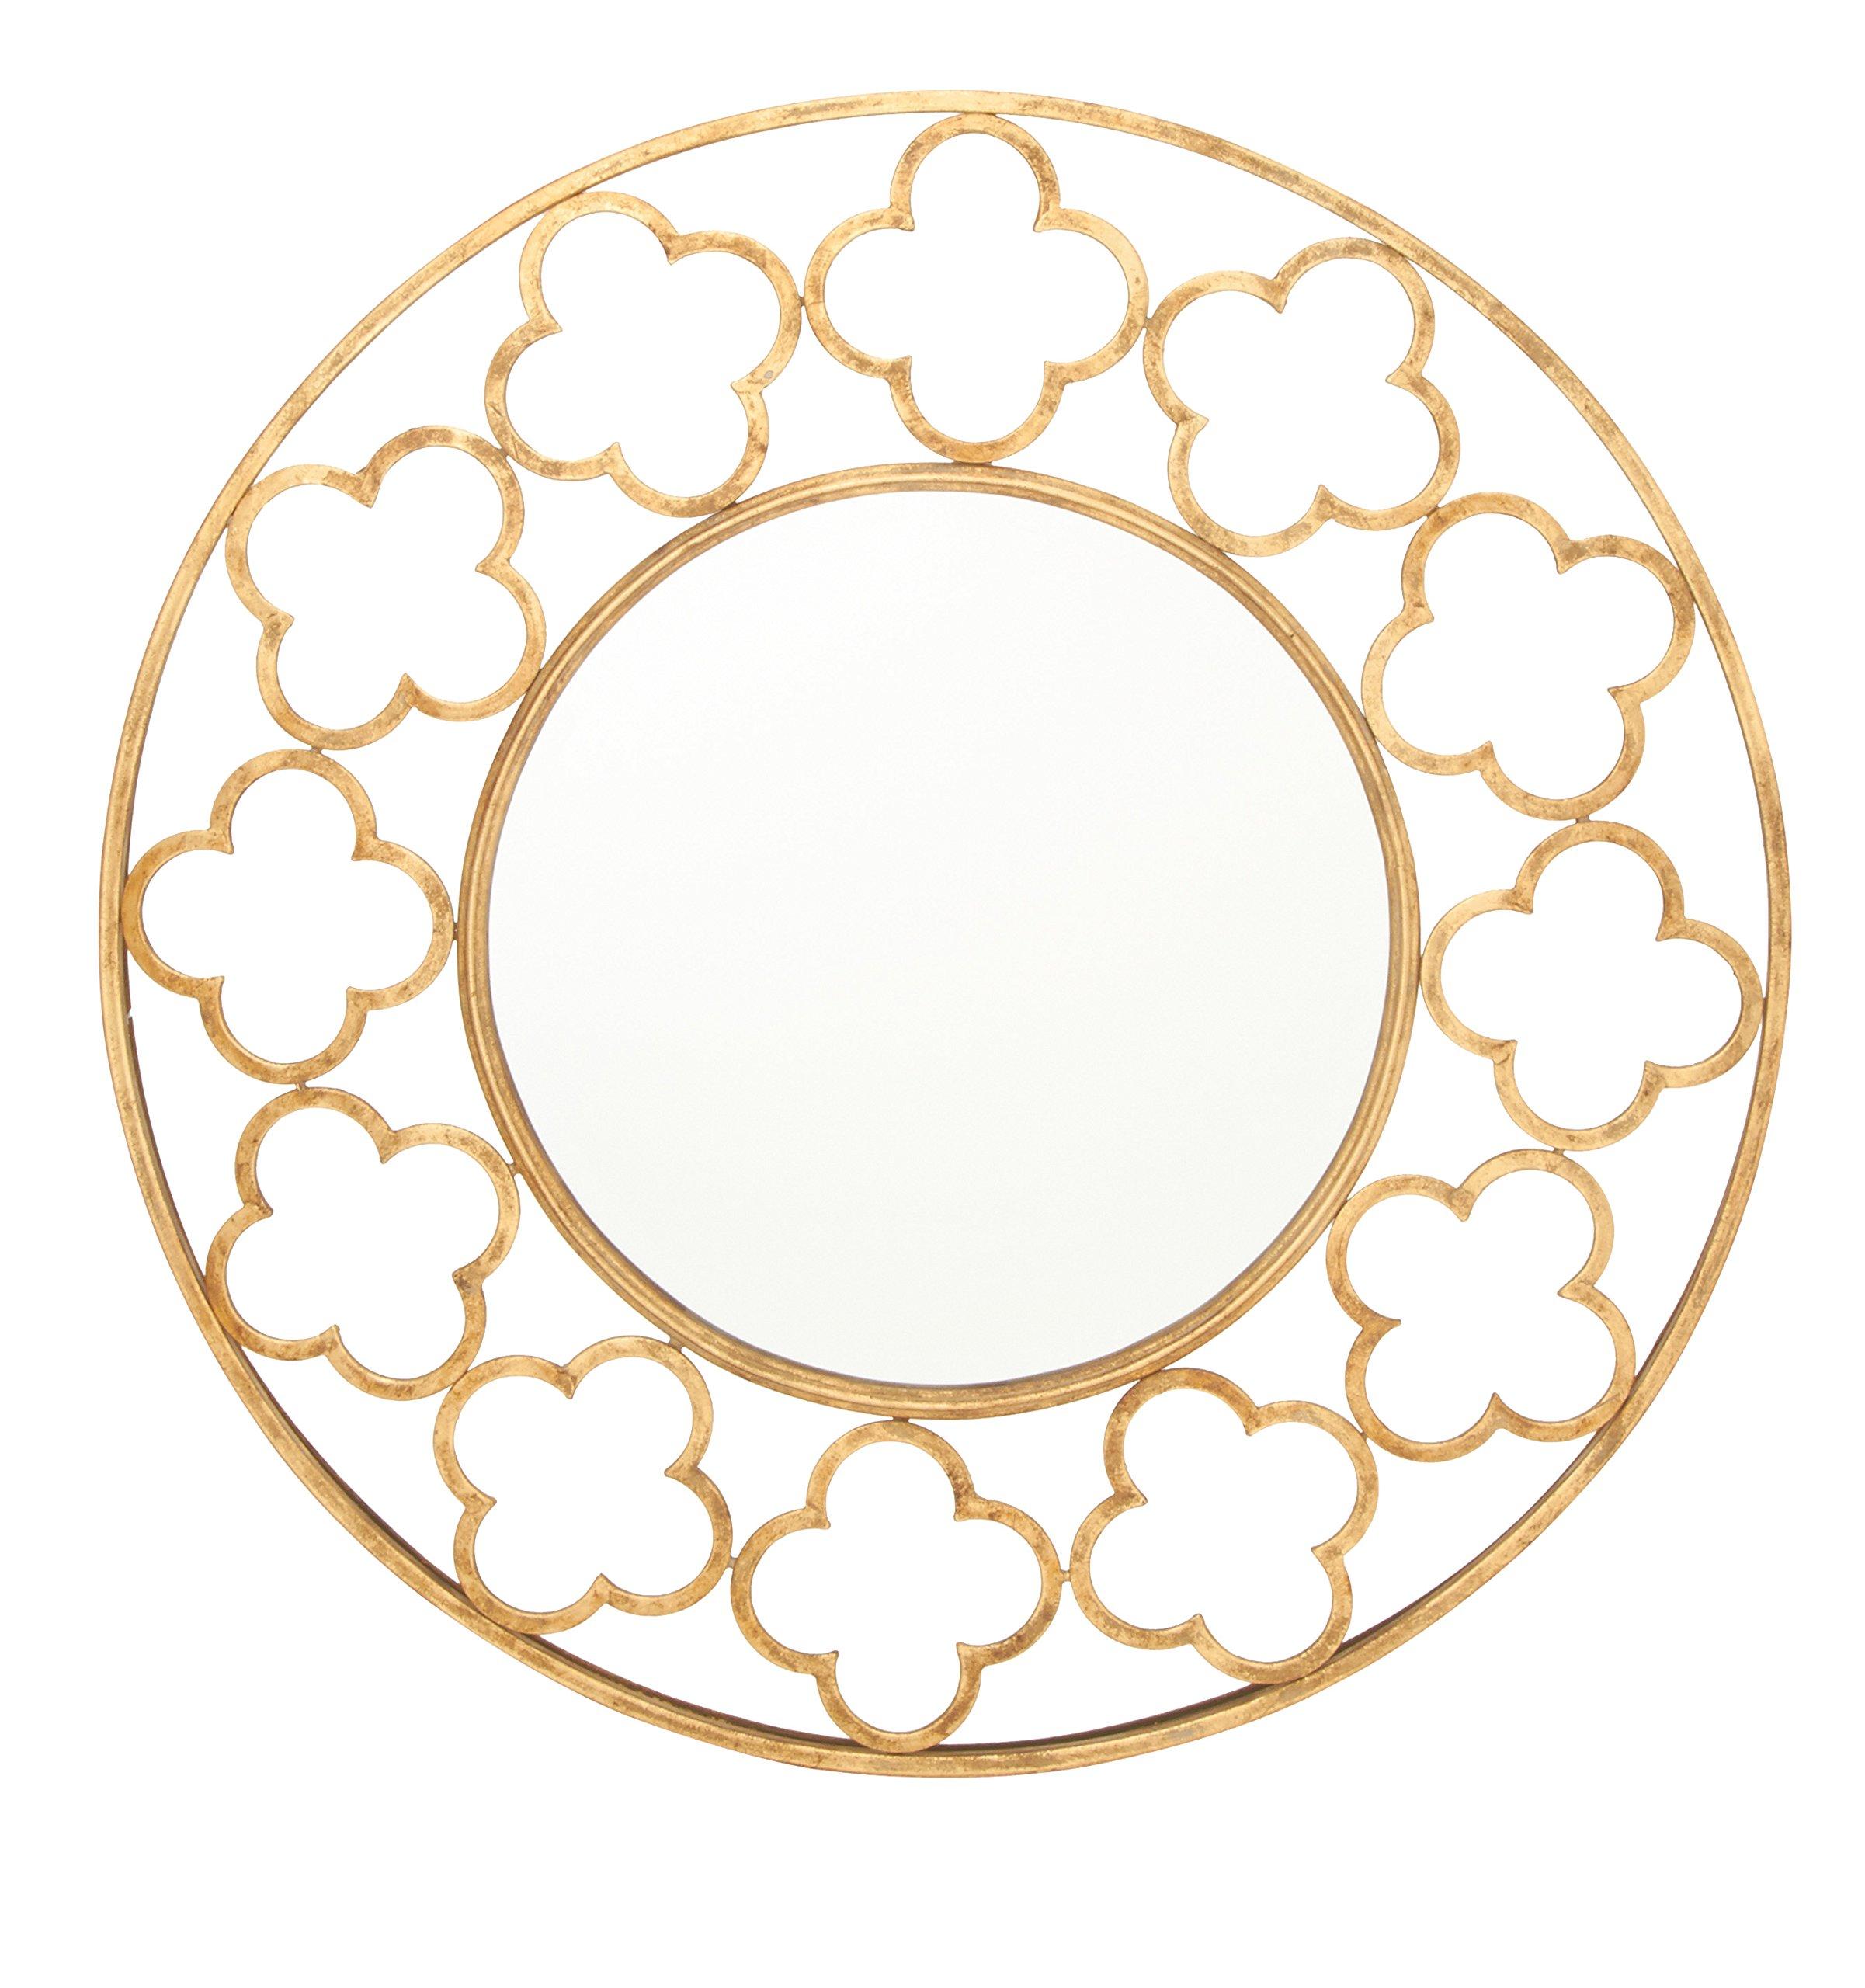 Interior Mirrors -  -  - 81 YwGObKrL -